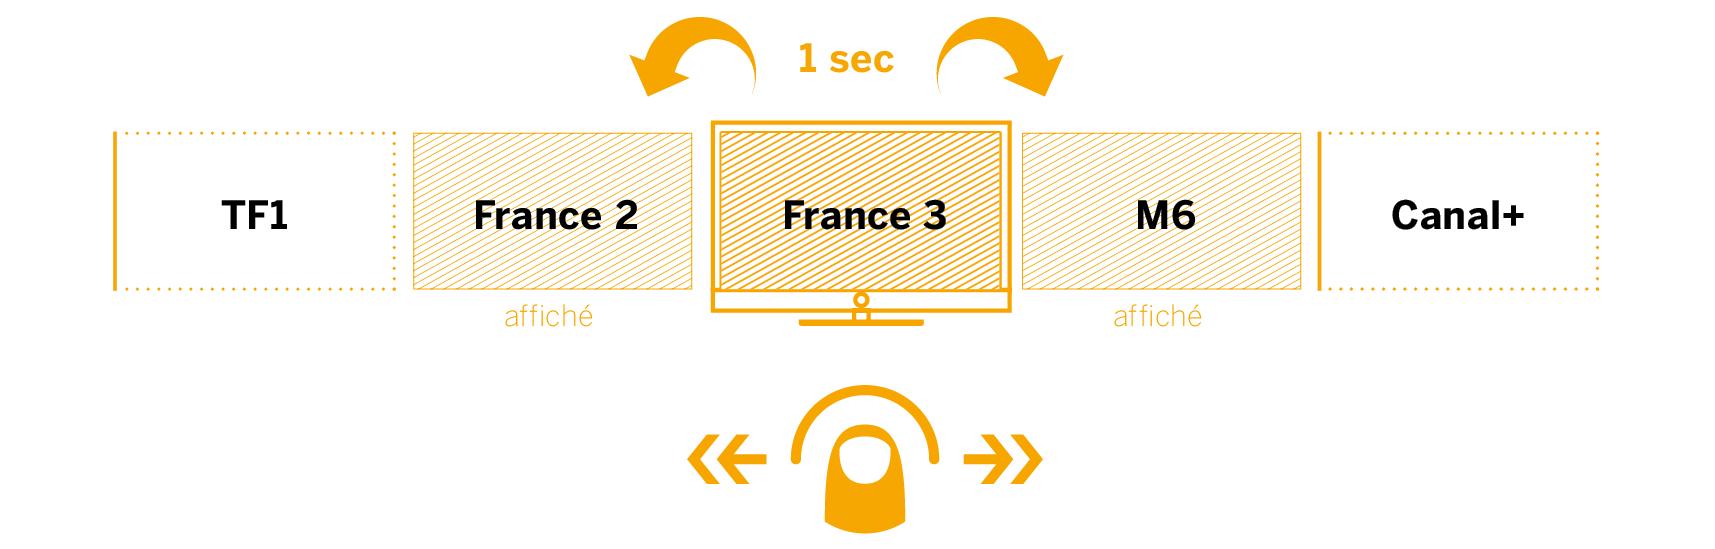 Loewe instant Channel ChangementLoewe instant Channel Changement rapide des chaînes. Loewe Art 40 UHD controlsound